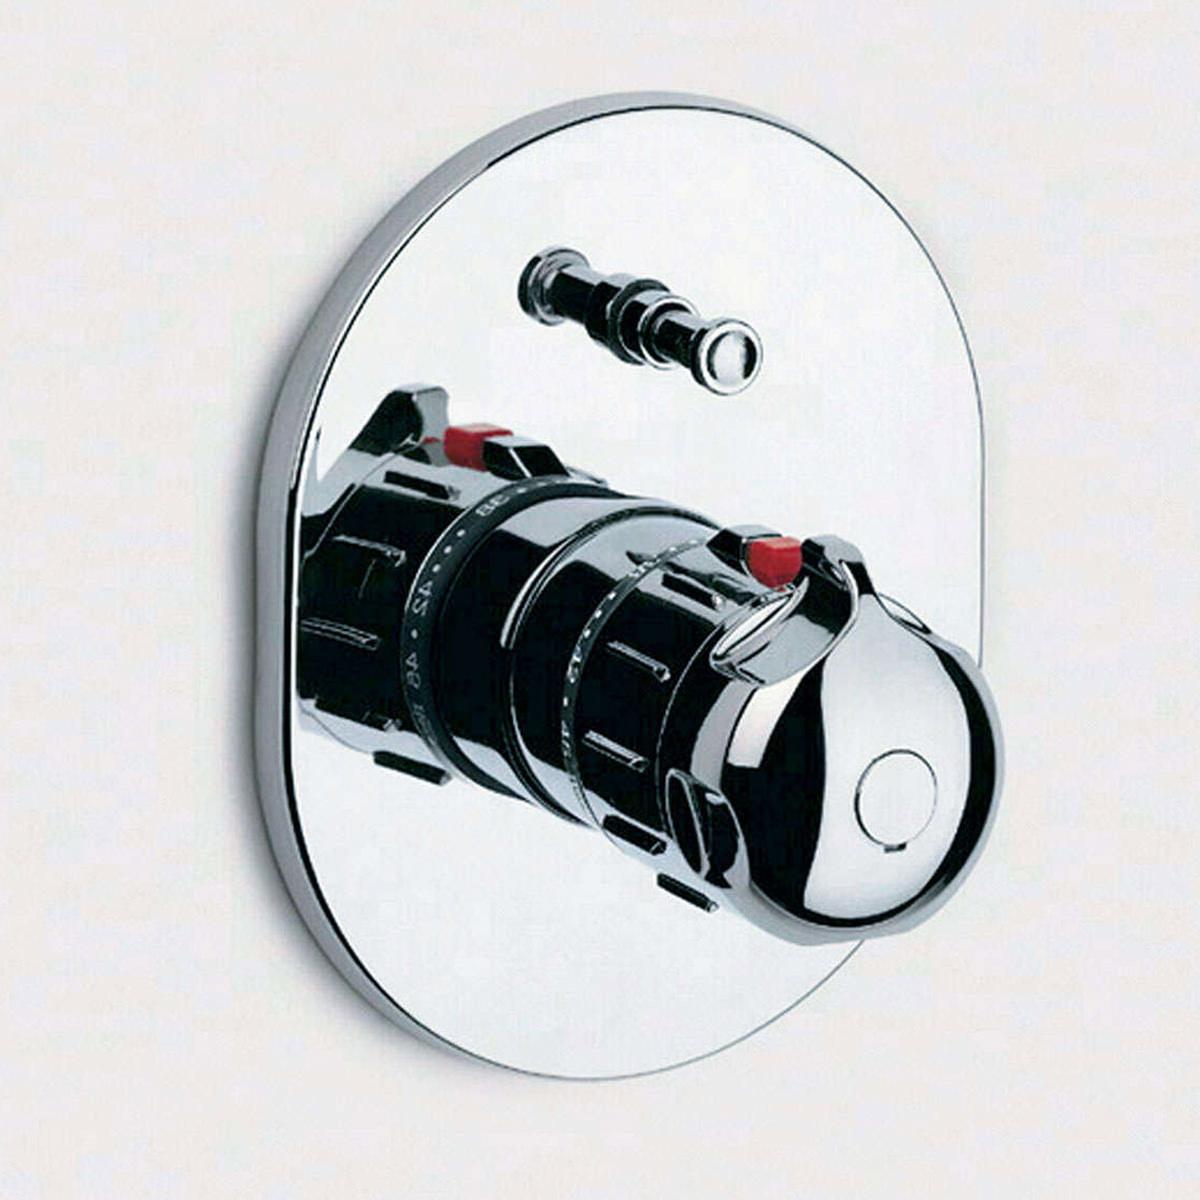 roca prada built in thermostatic bath or shower mixer valve